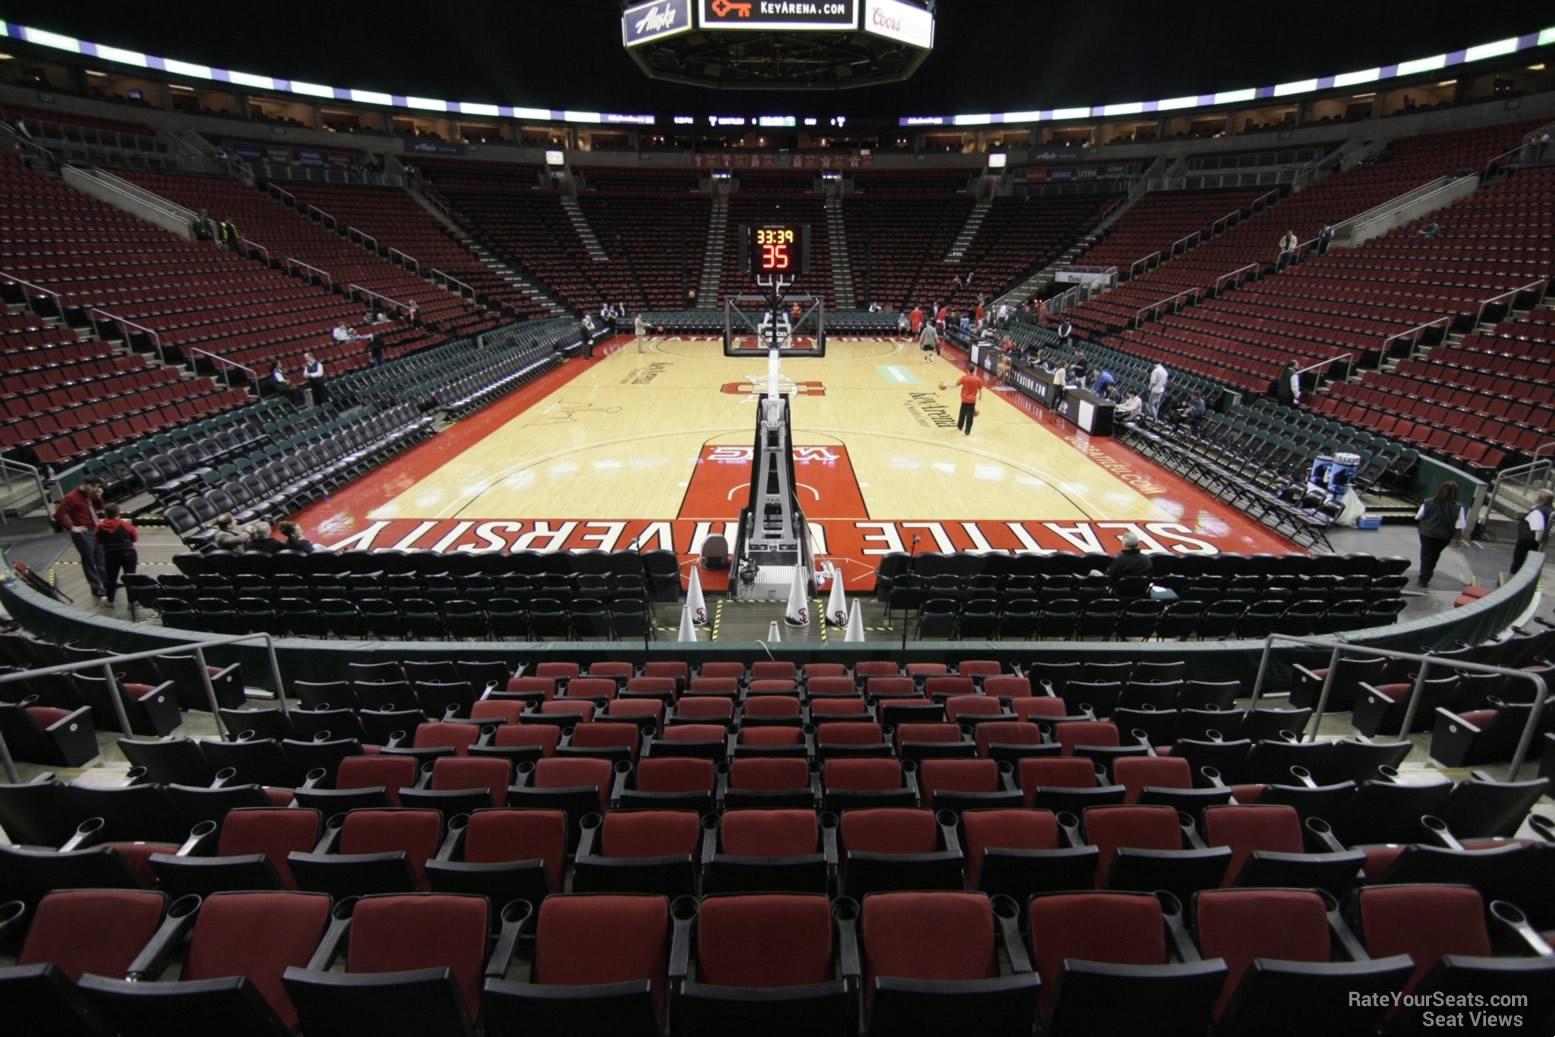 Keyarena section 107 basketball seating rateyourseats com